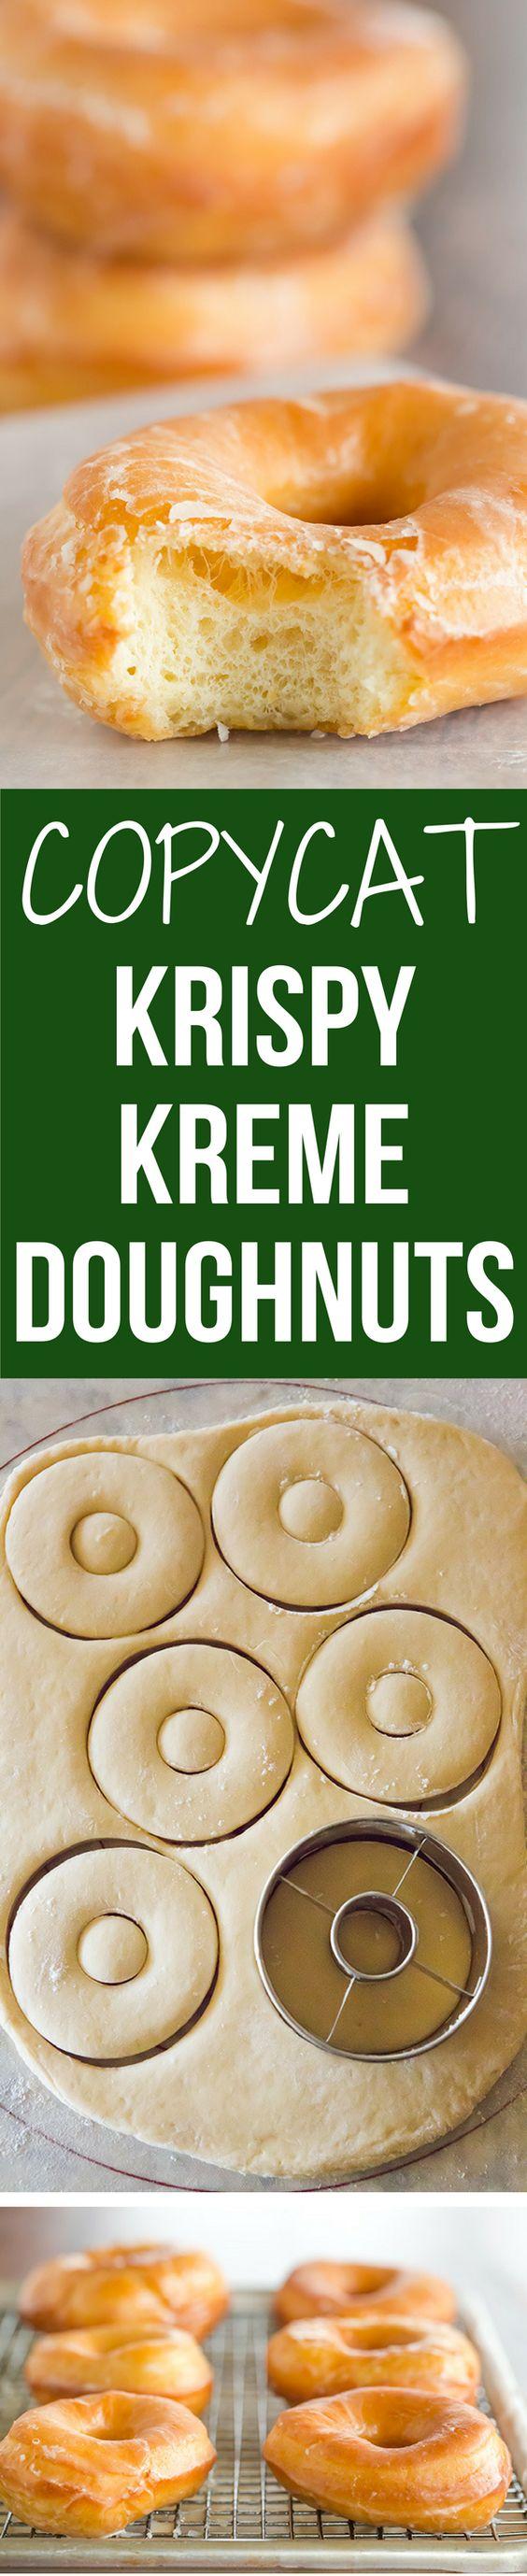 Copycat Krispy Kreme Doughnuts - A copycat recipe for Krispy Kreme doughnuts – they're light, airy and covered in a barely-there glaze.